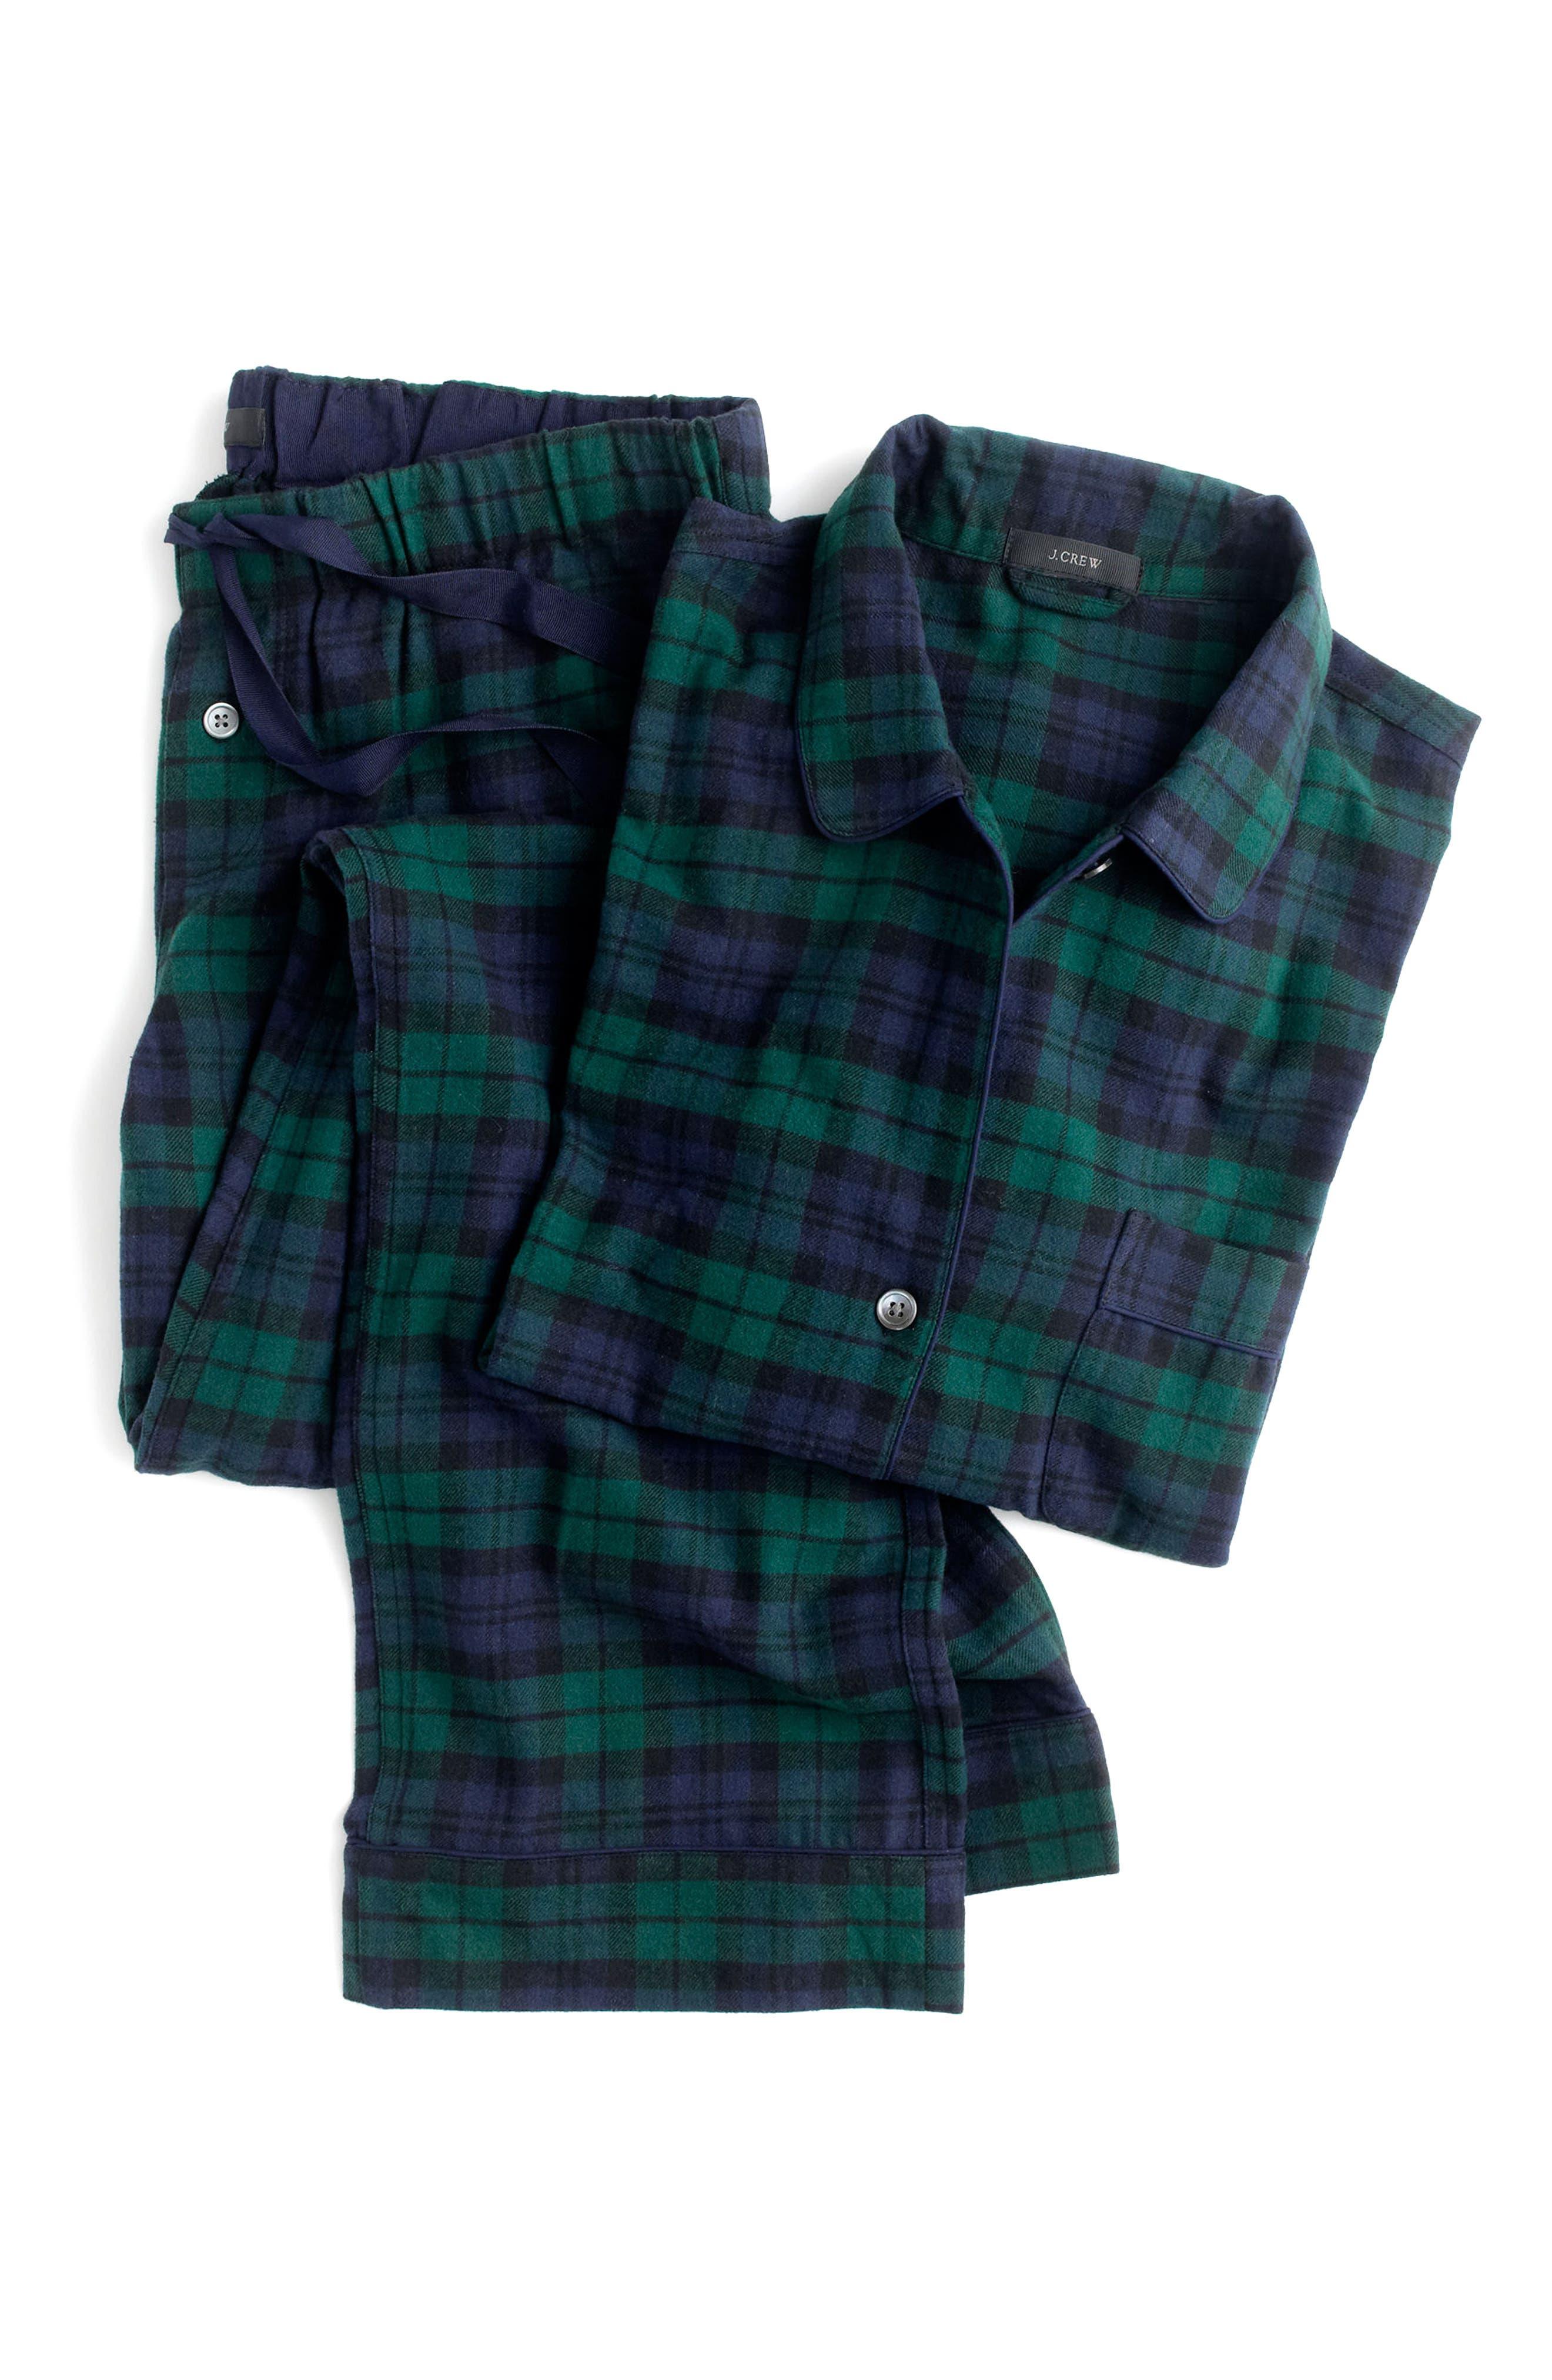 J.CREW,                             Blackwatch Flannel Pajamas,                             Alternate thumbnail 4, color,                             001